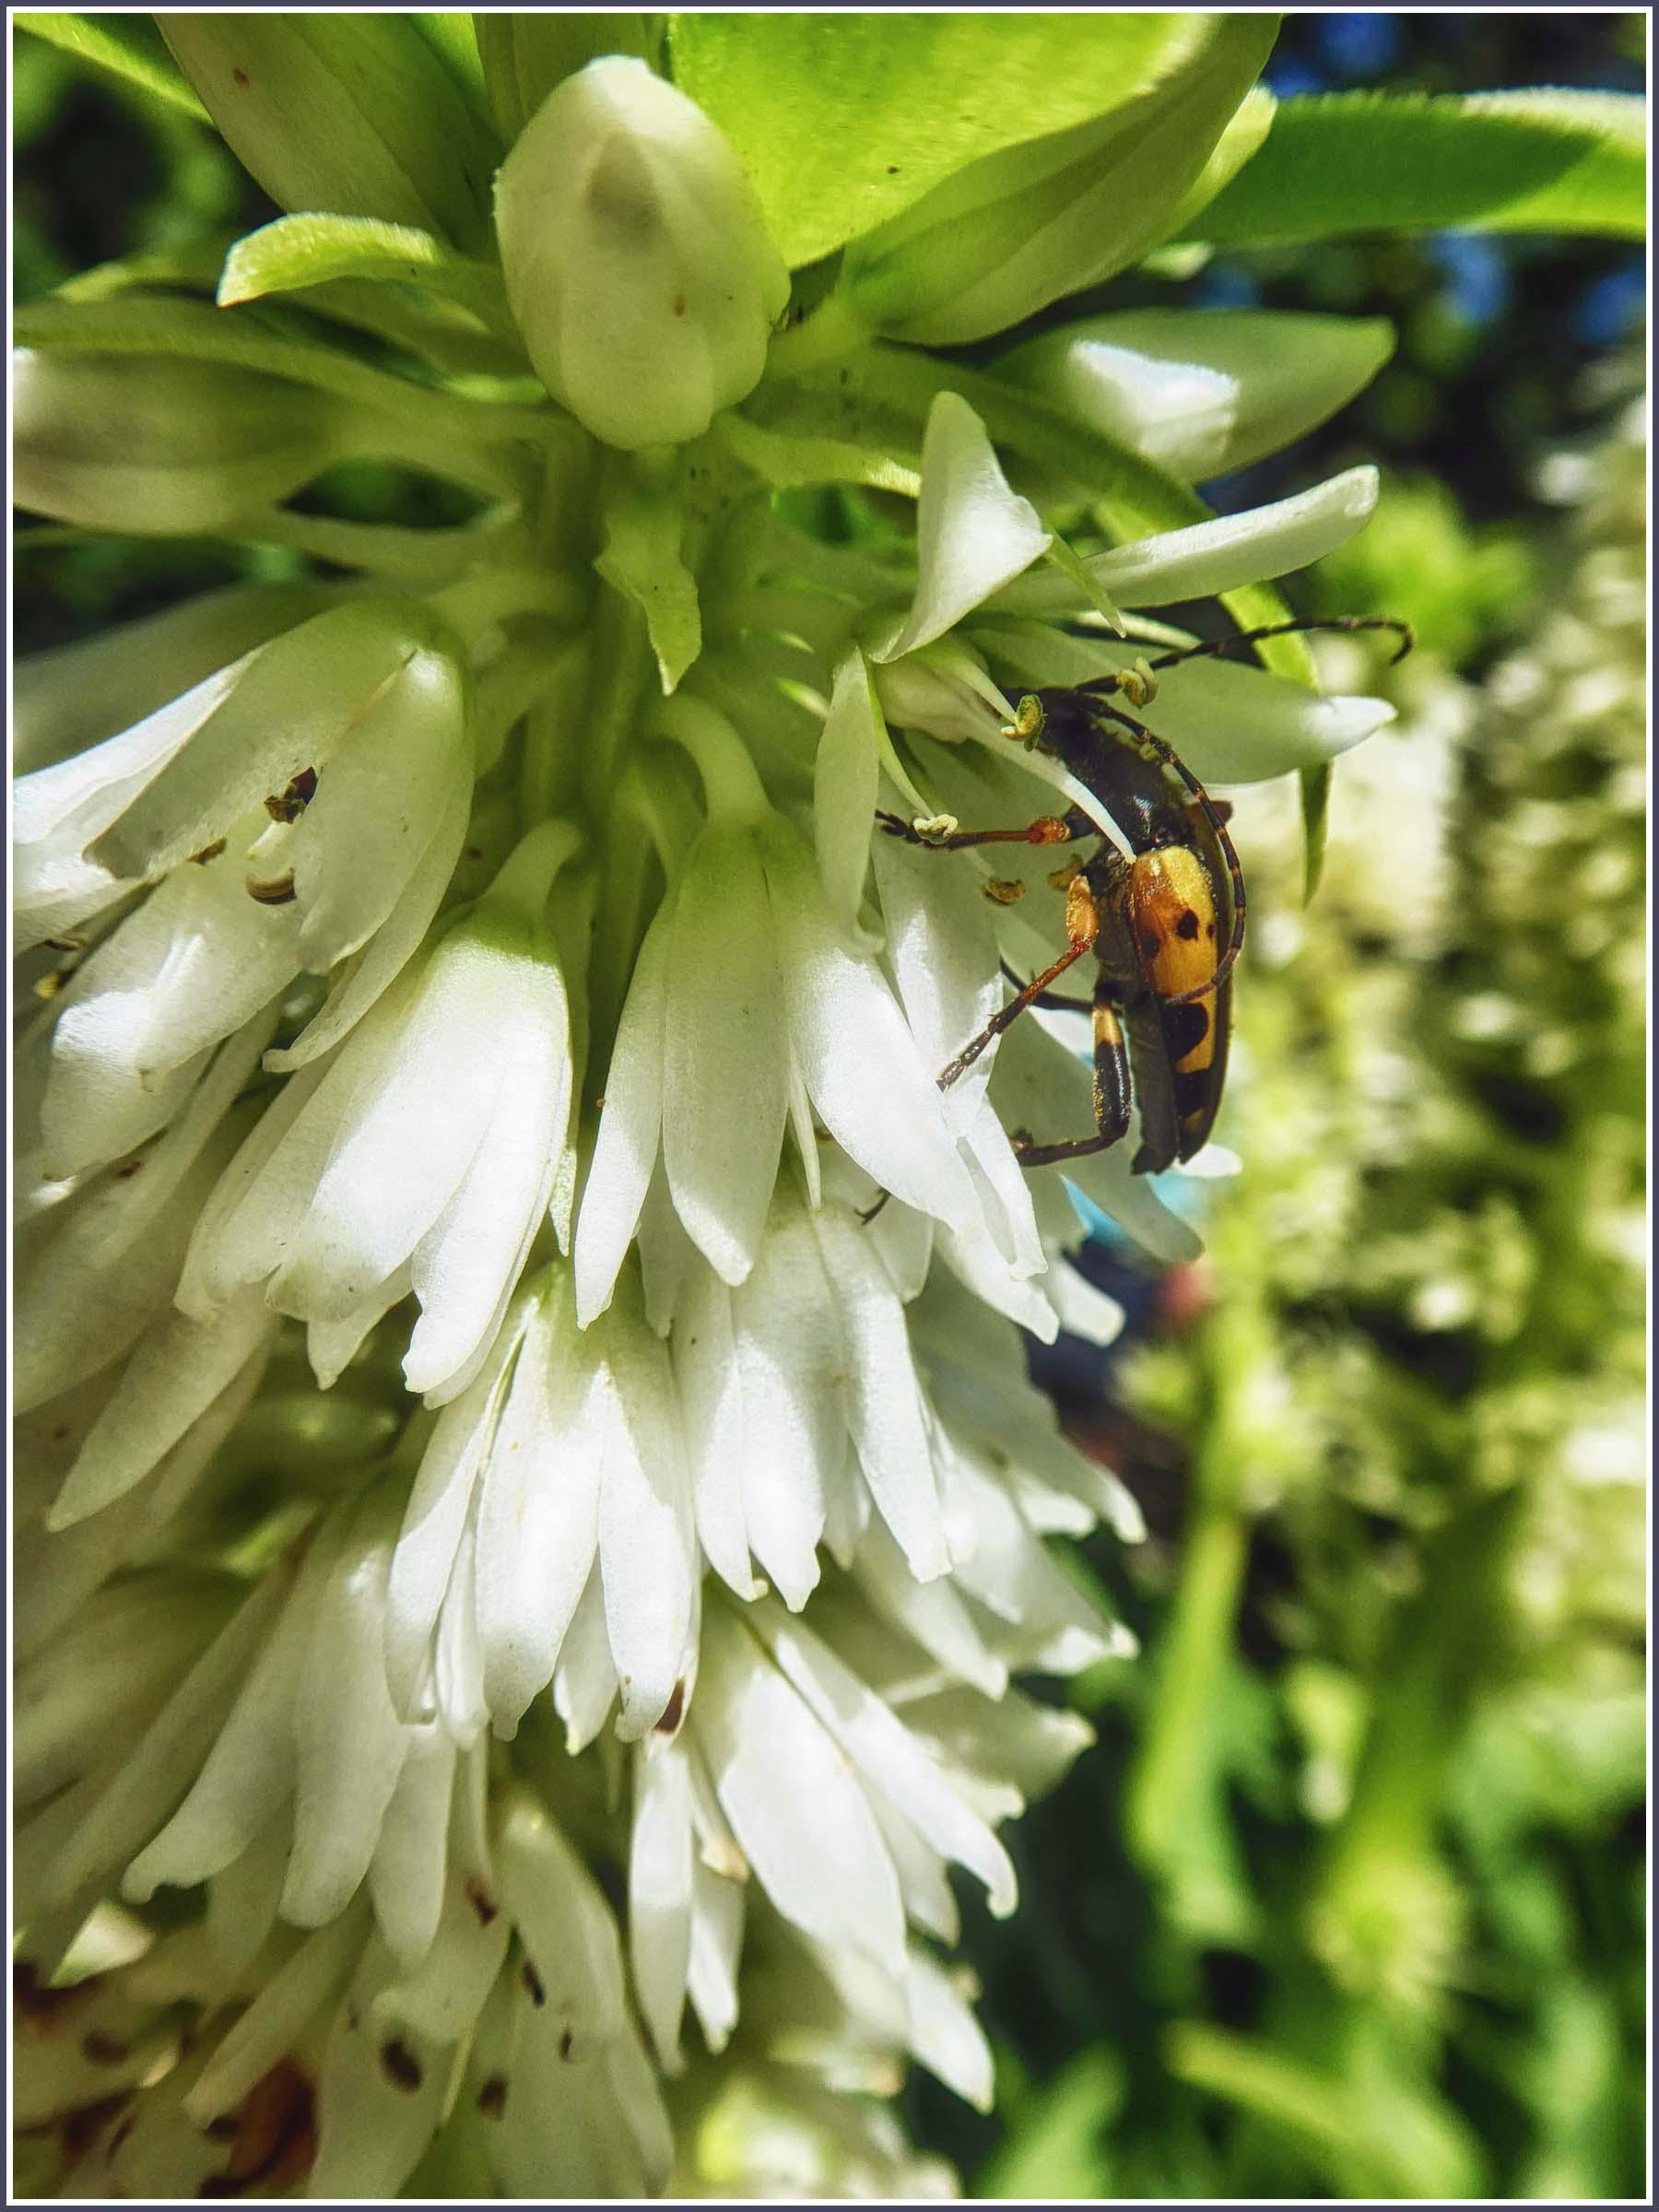 Beetle on white flowers